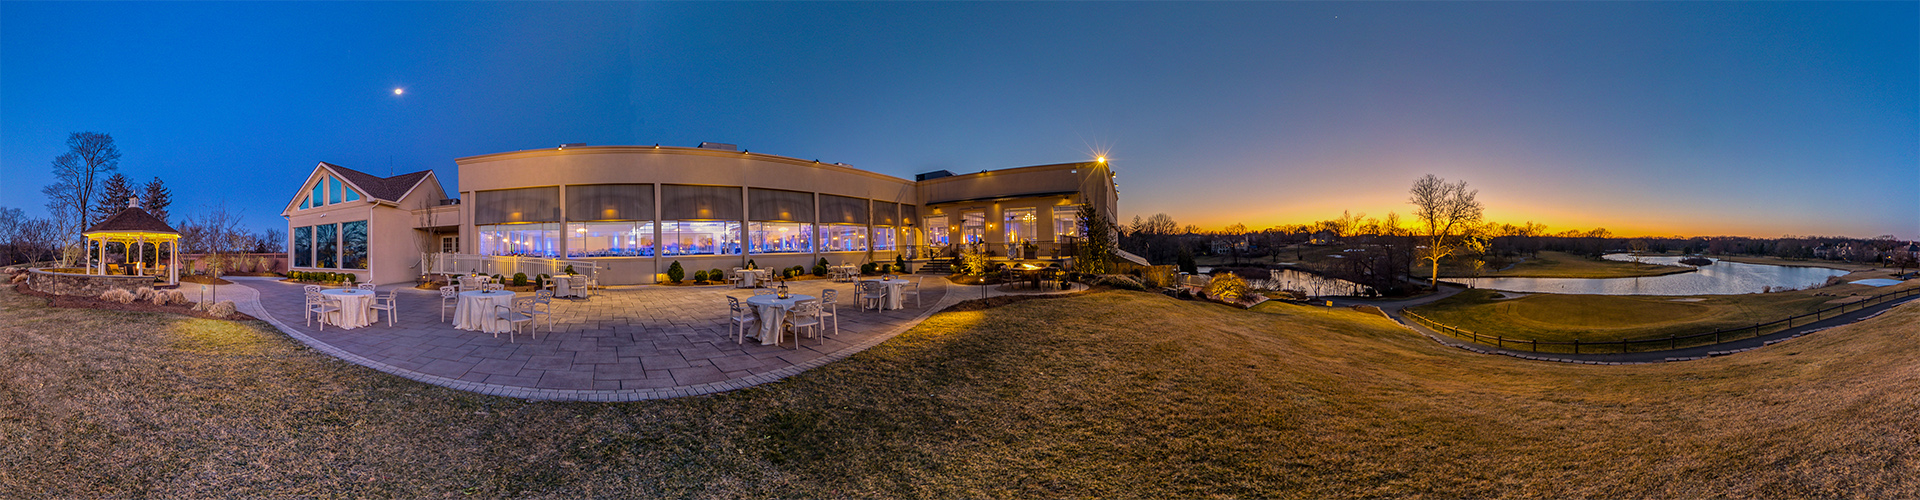 Brooklake Country Club wedding venue NJ by 360SiteVisit